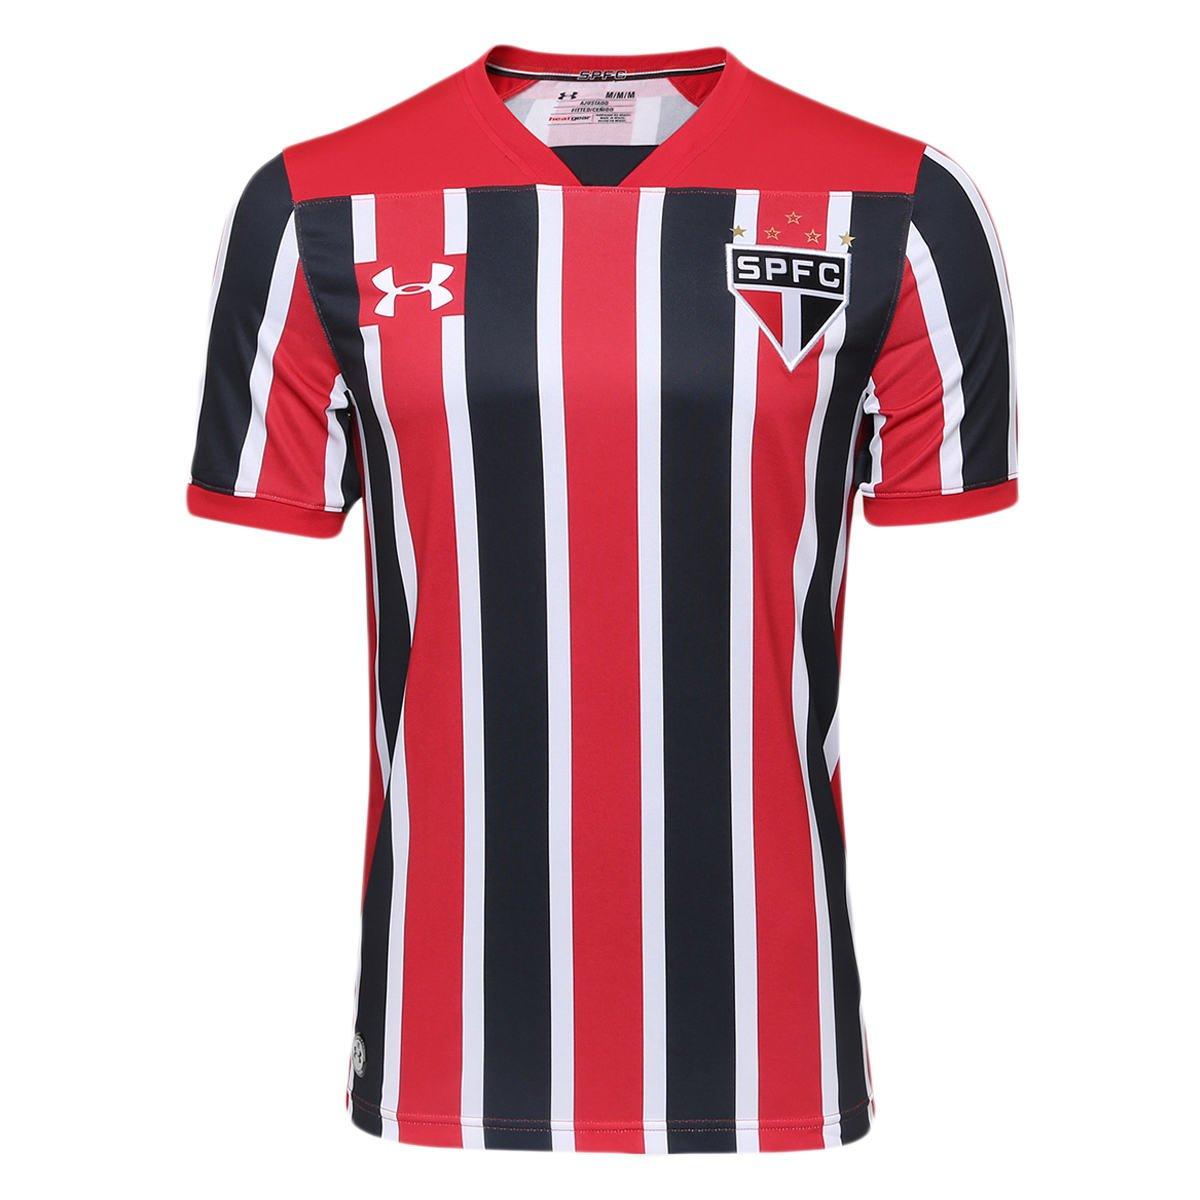 5fbd575784f Camisa São Paulo II 2017 Under Armour